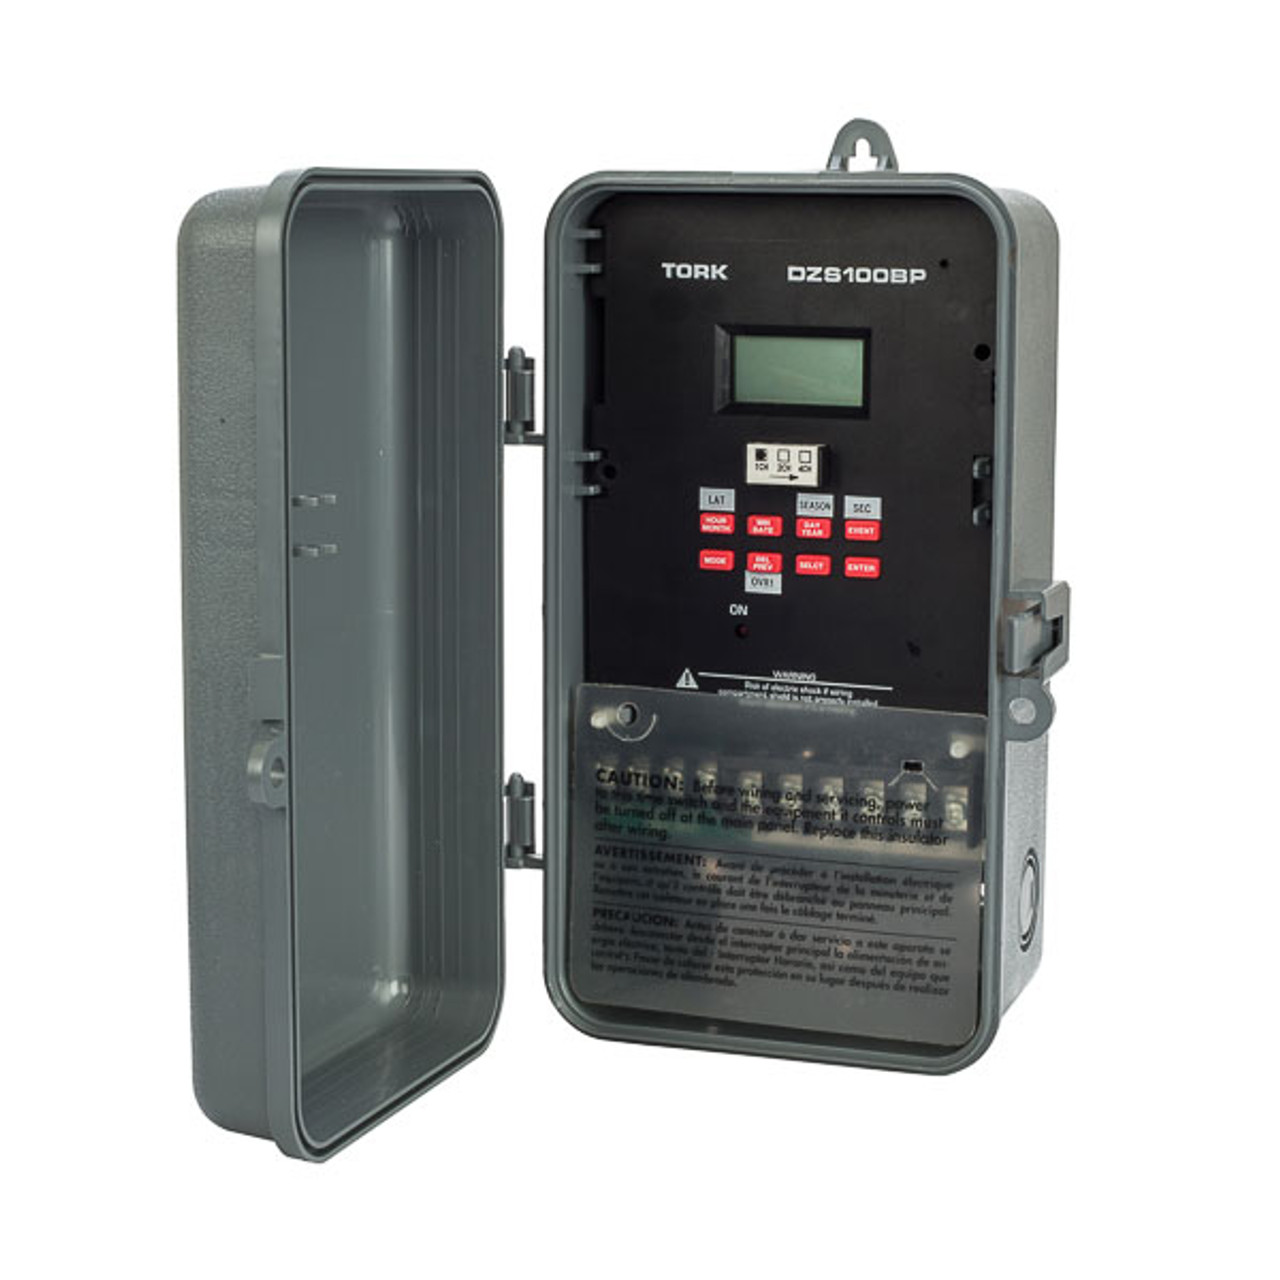 Tork DZS100BP, 1 Channel Multipurpose Control